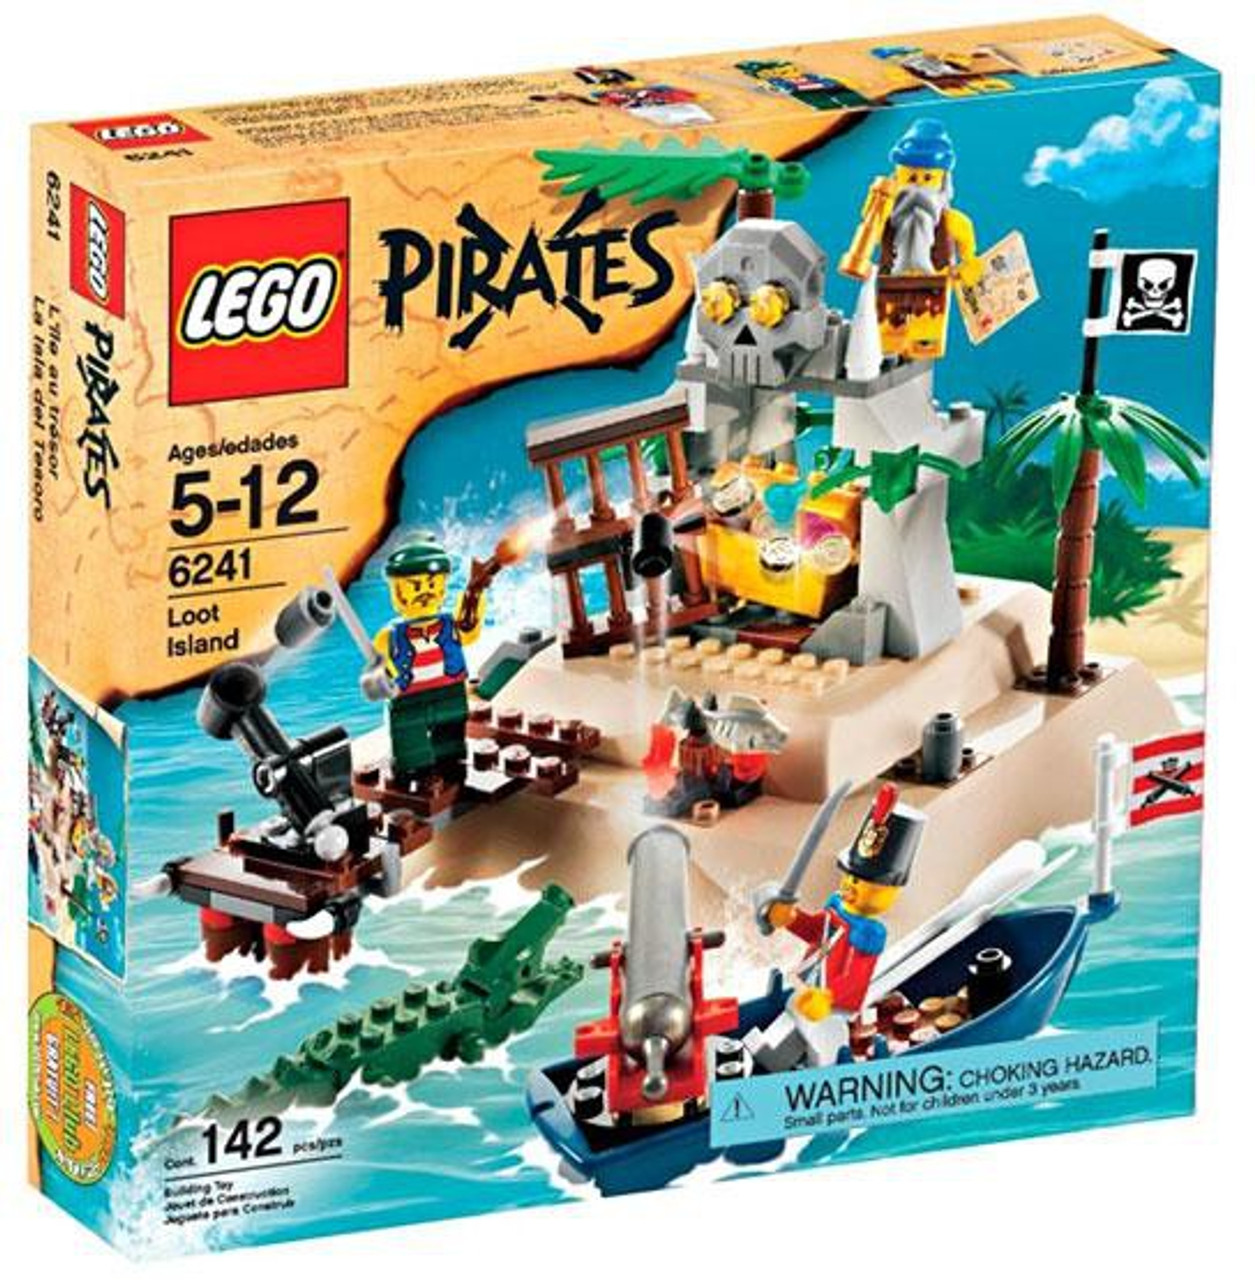 lego pirates loot island set 6241 - Lego Pirate